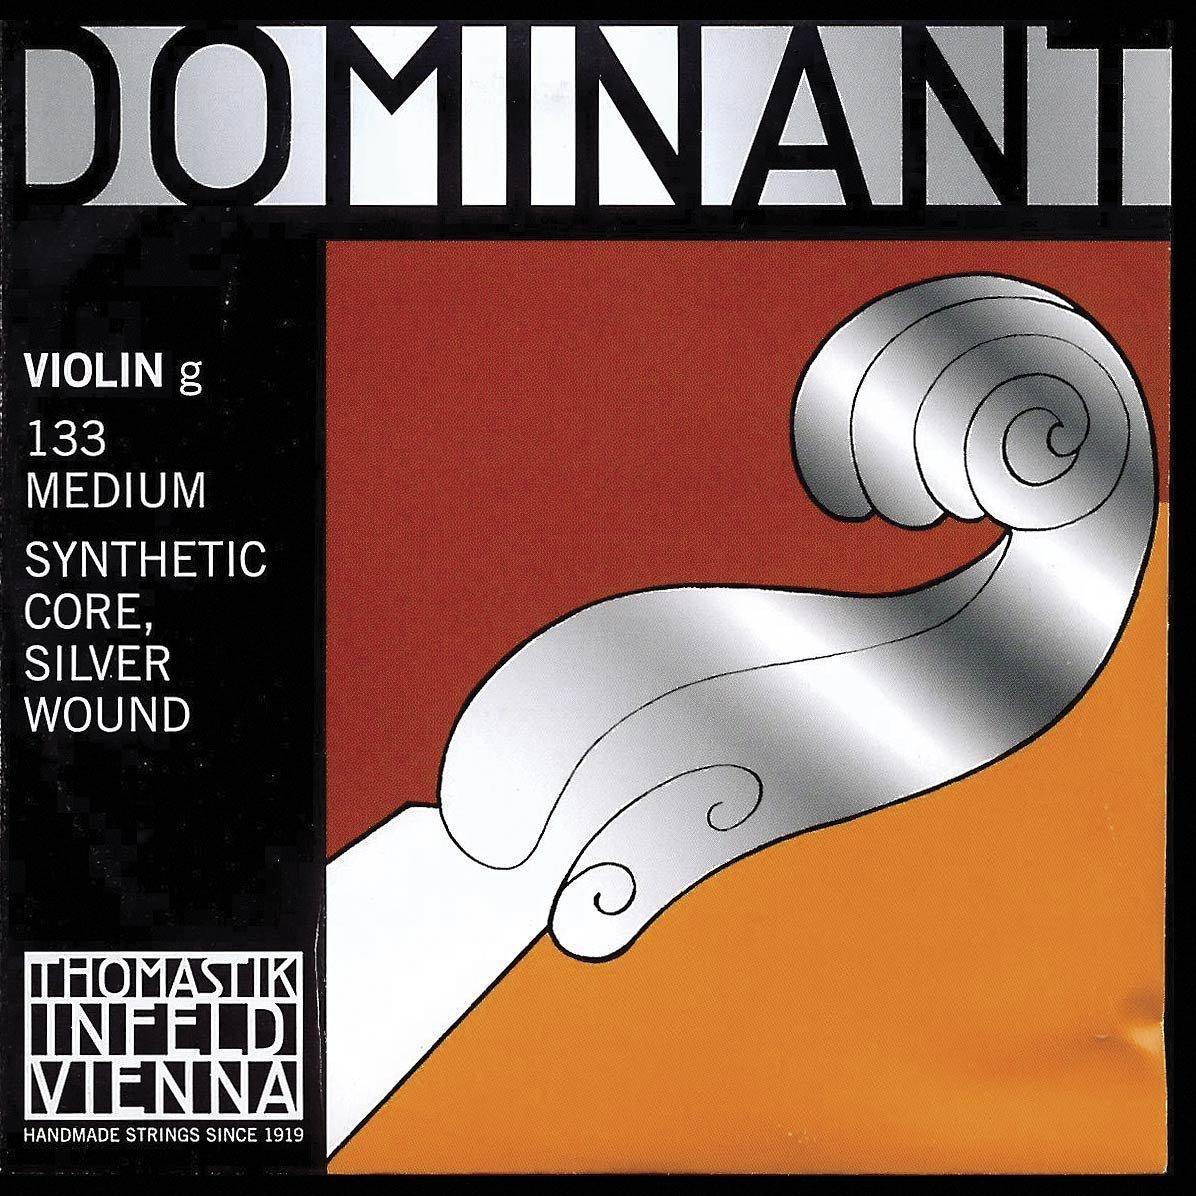 Thomastik Dominant 133, Violin G String